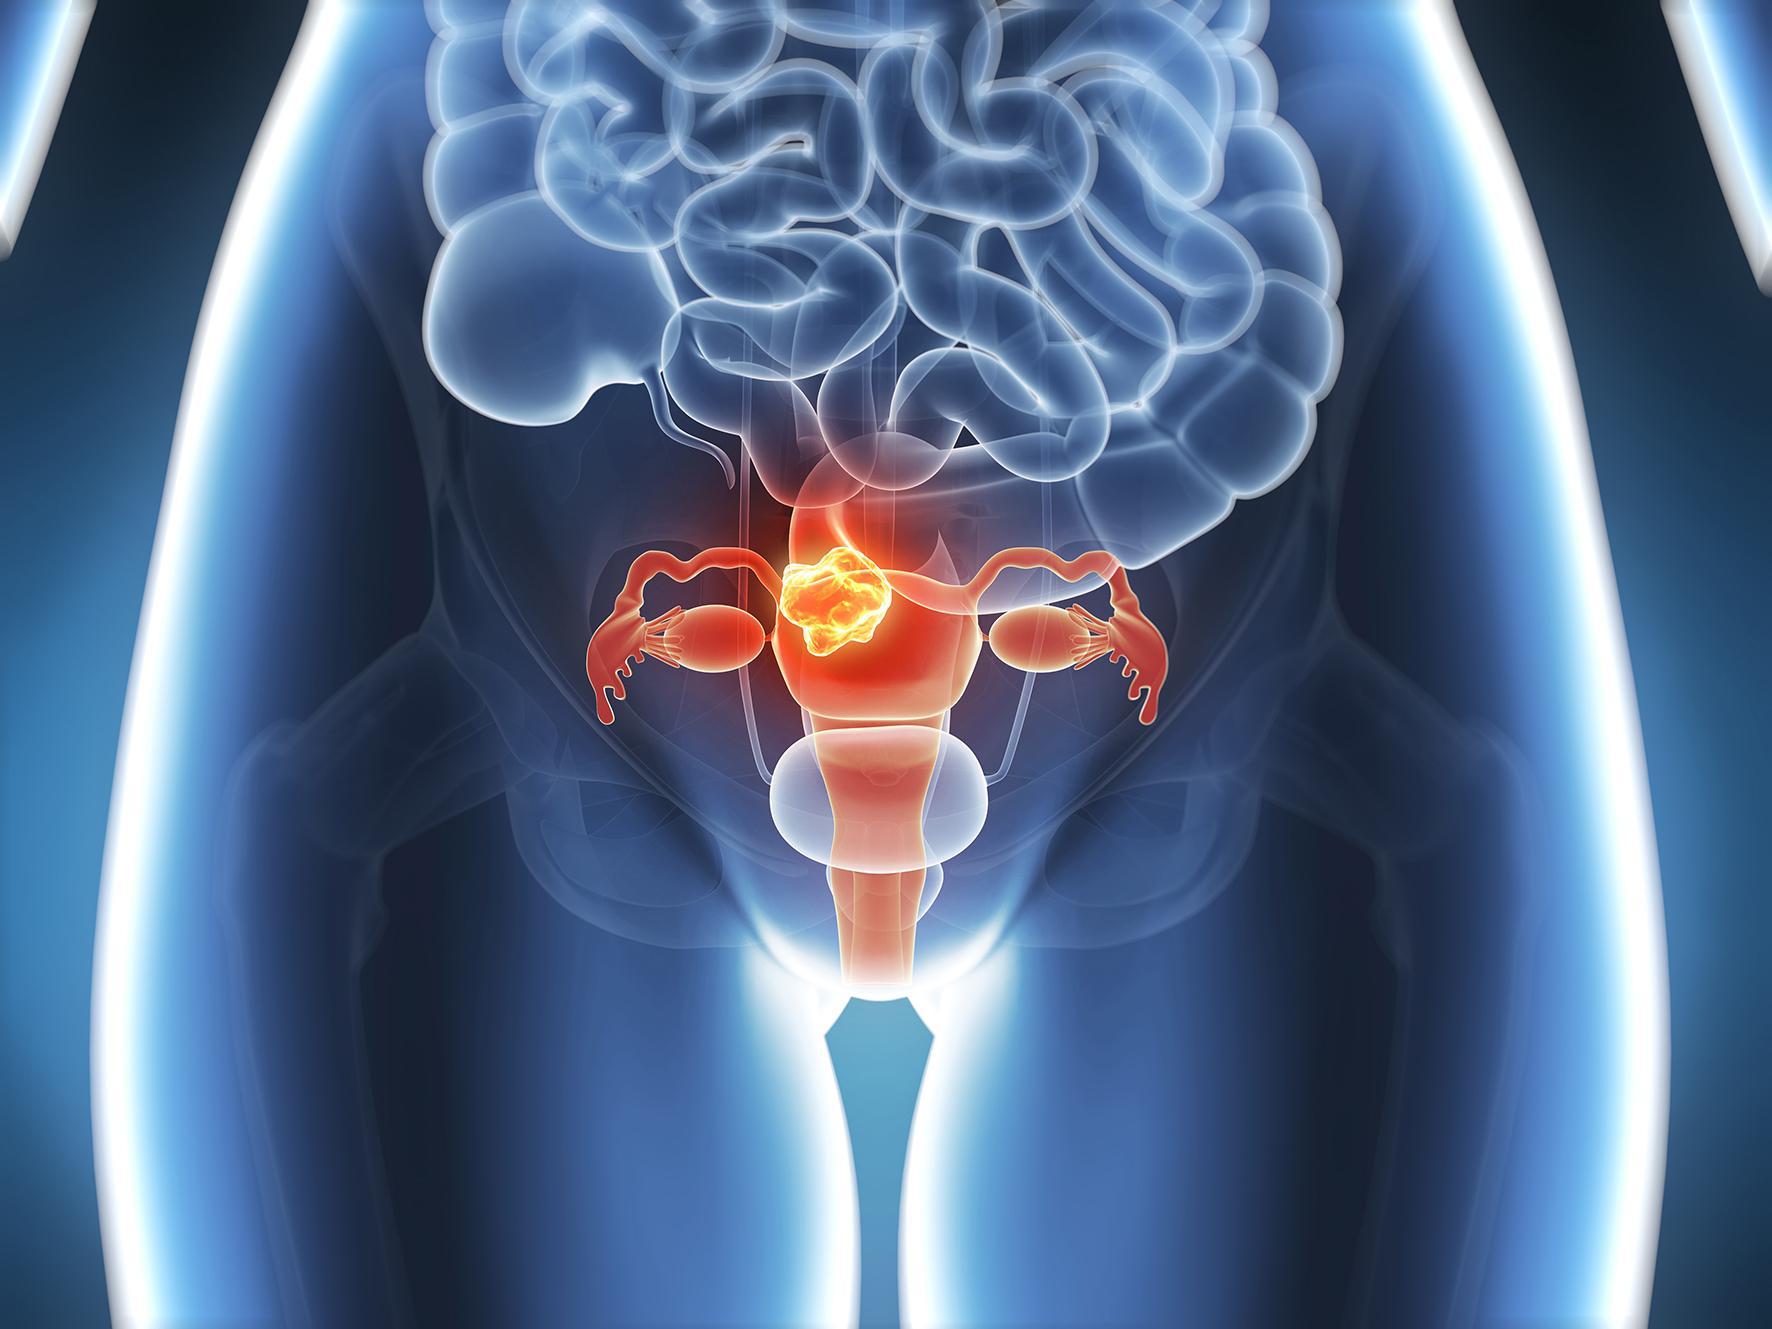 uterine cancer untreated